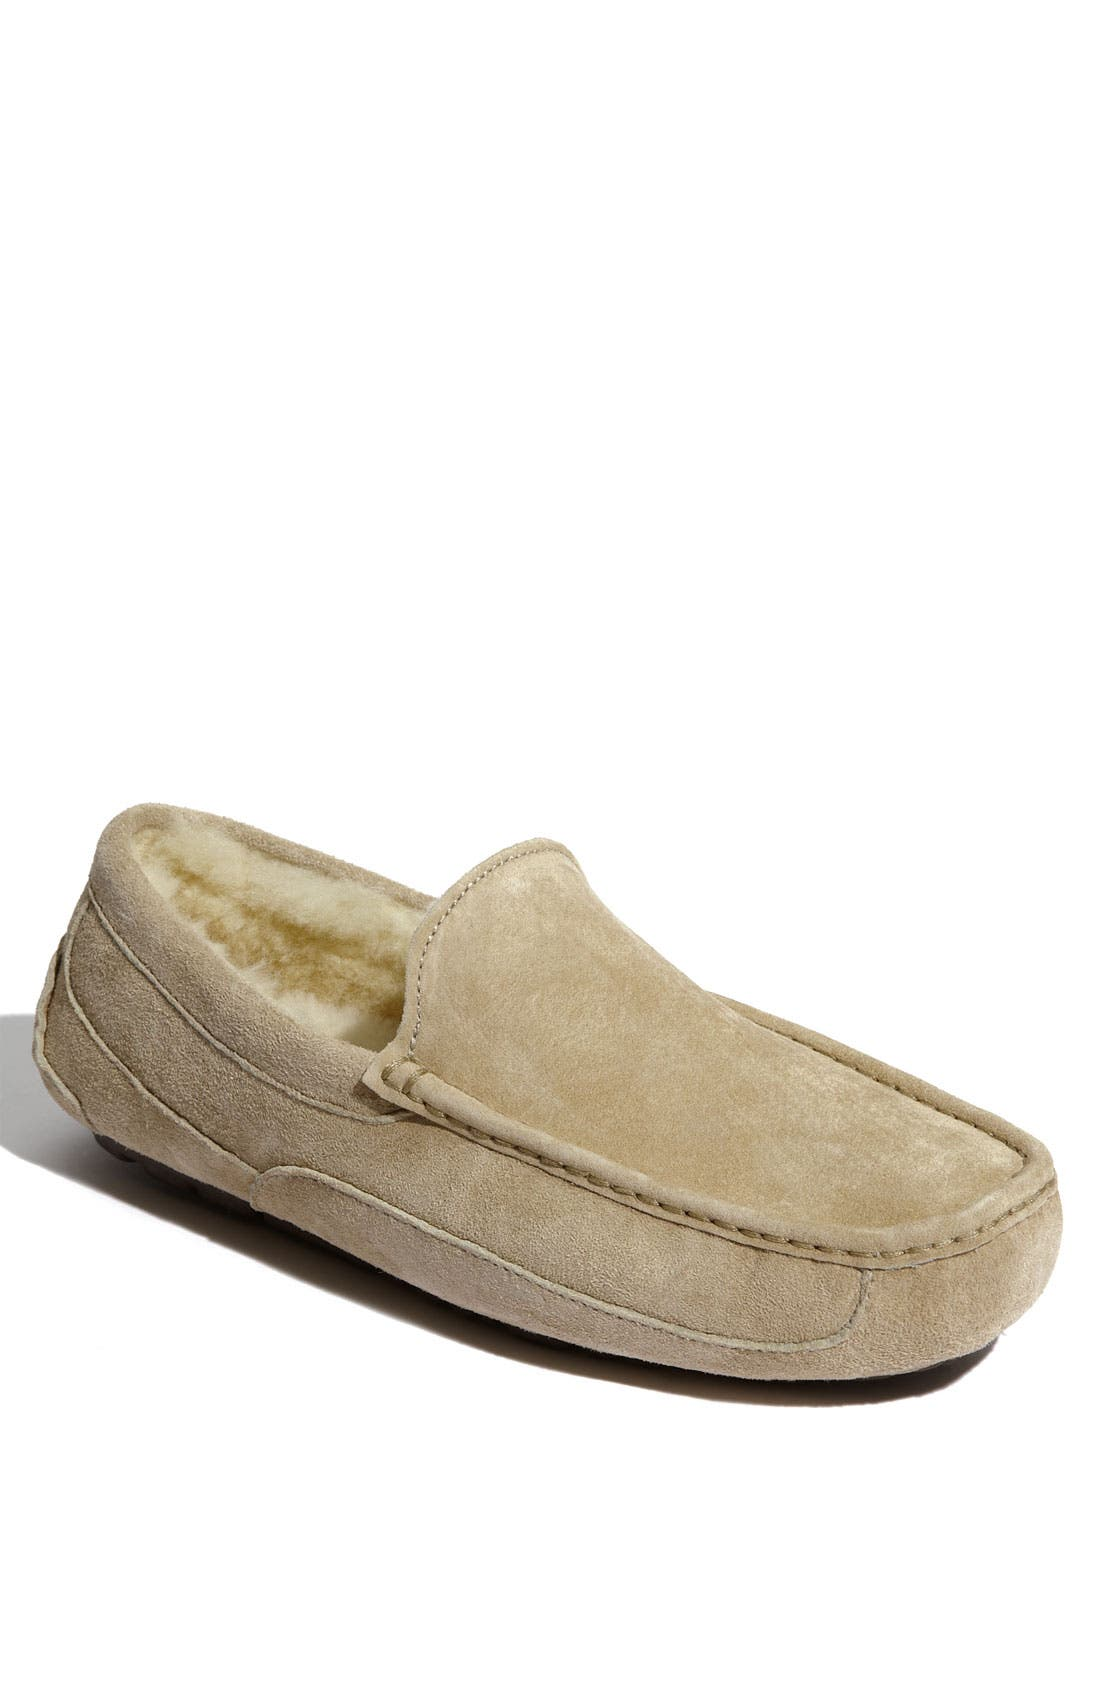 Main Image - UGG® Ascot Leather Slipper (Men)